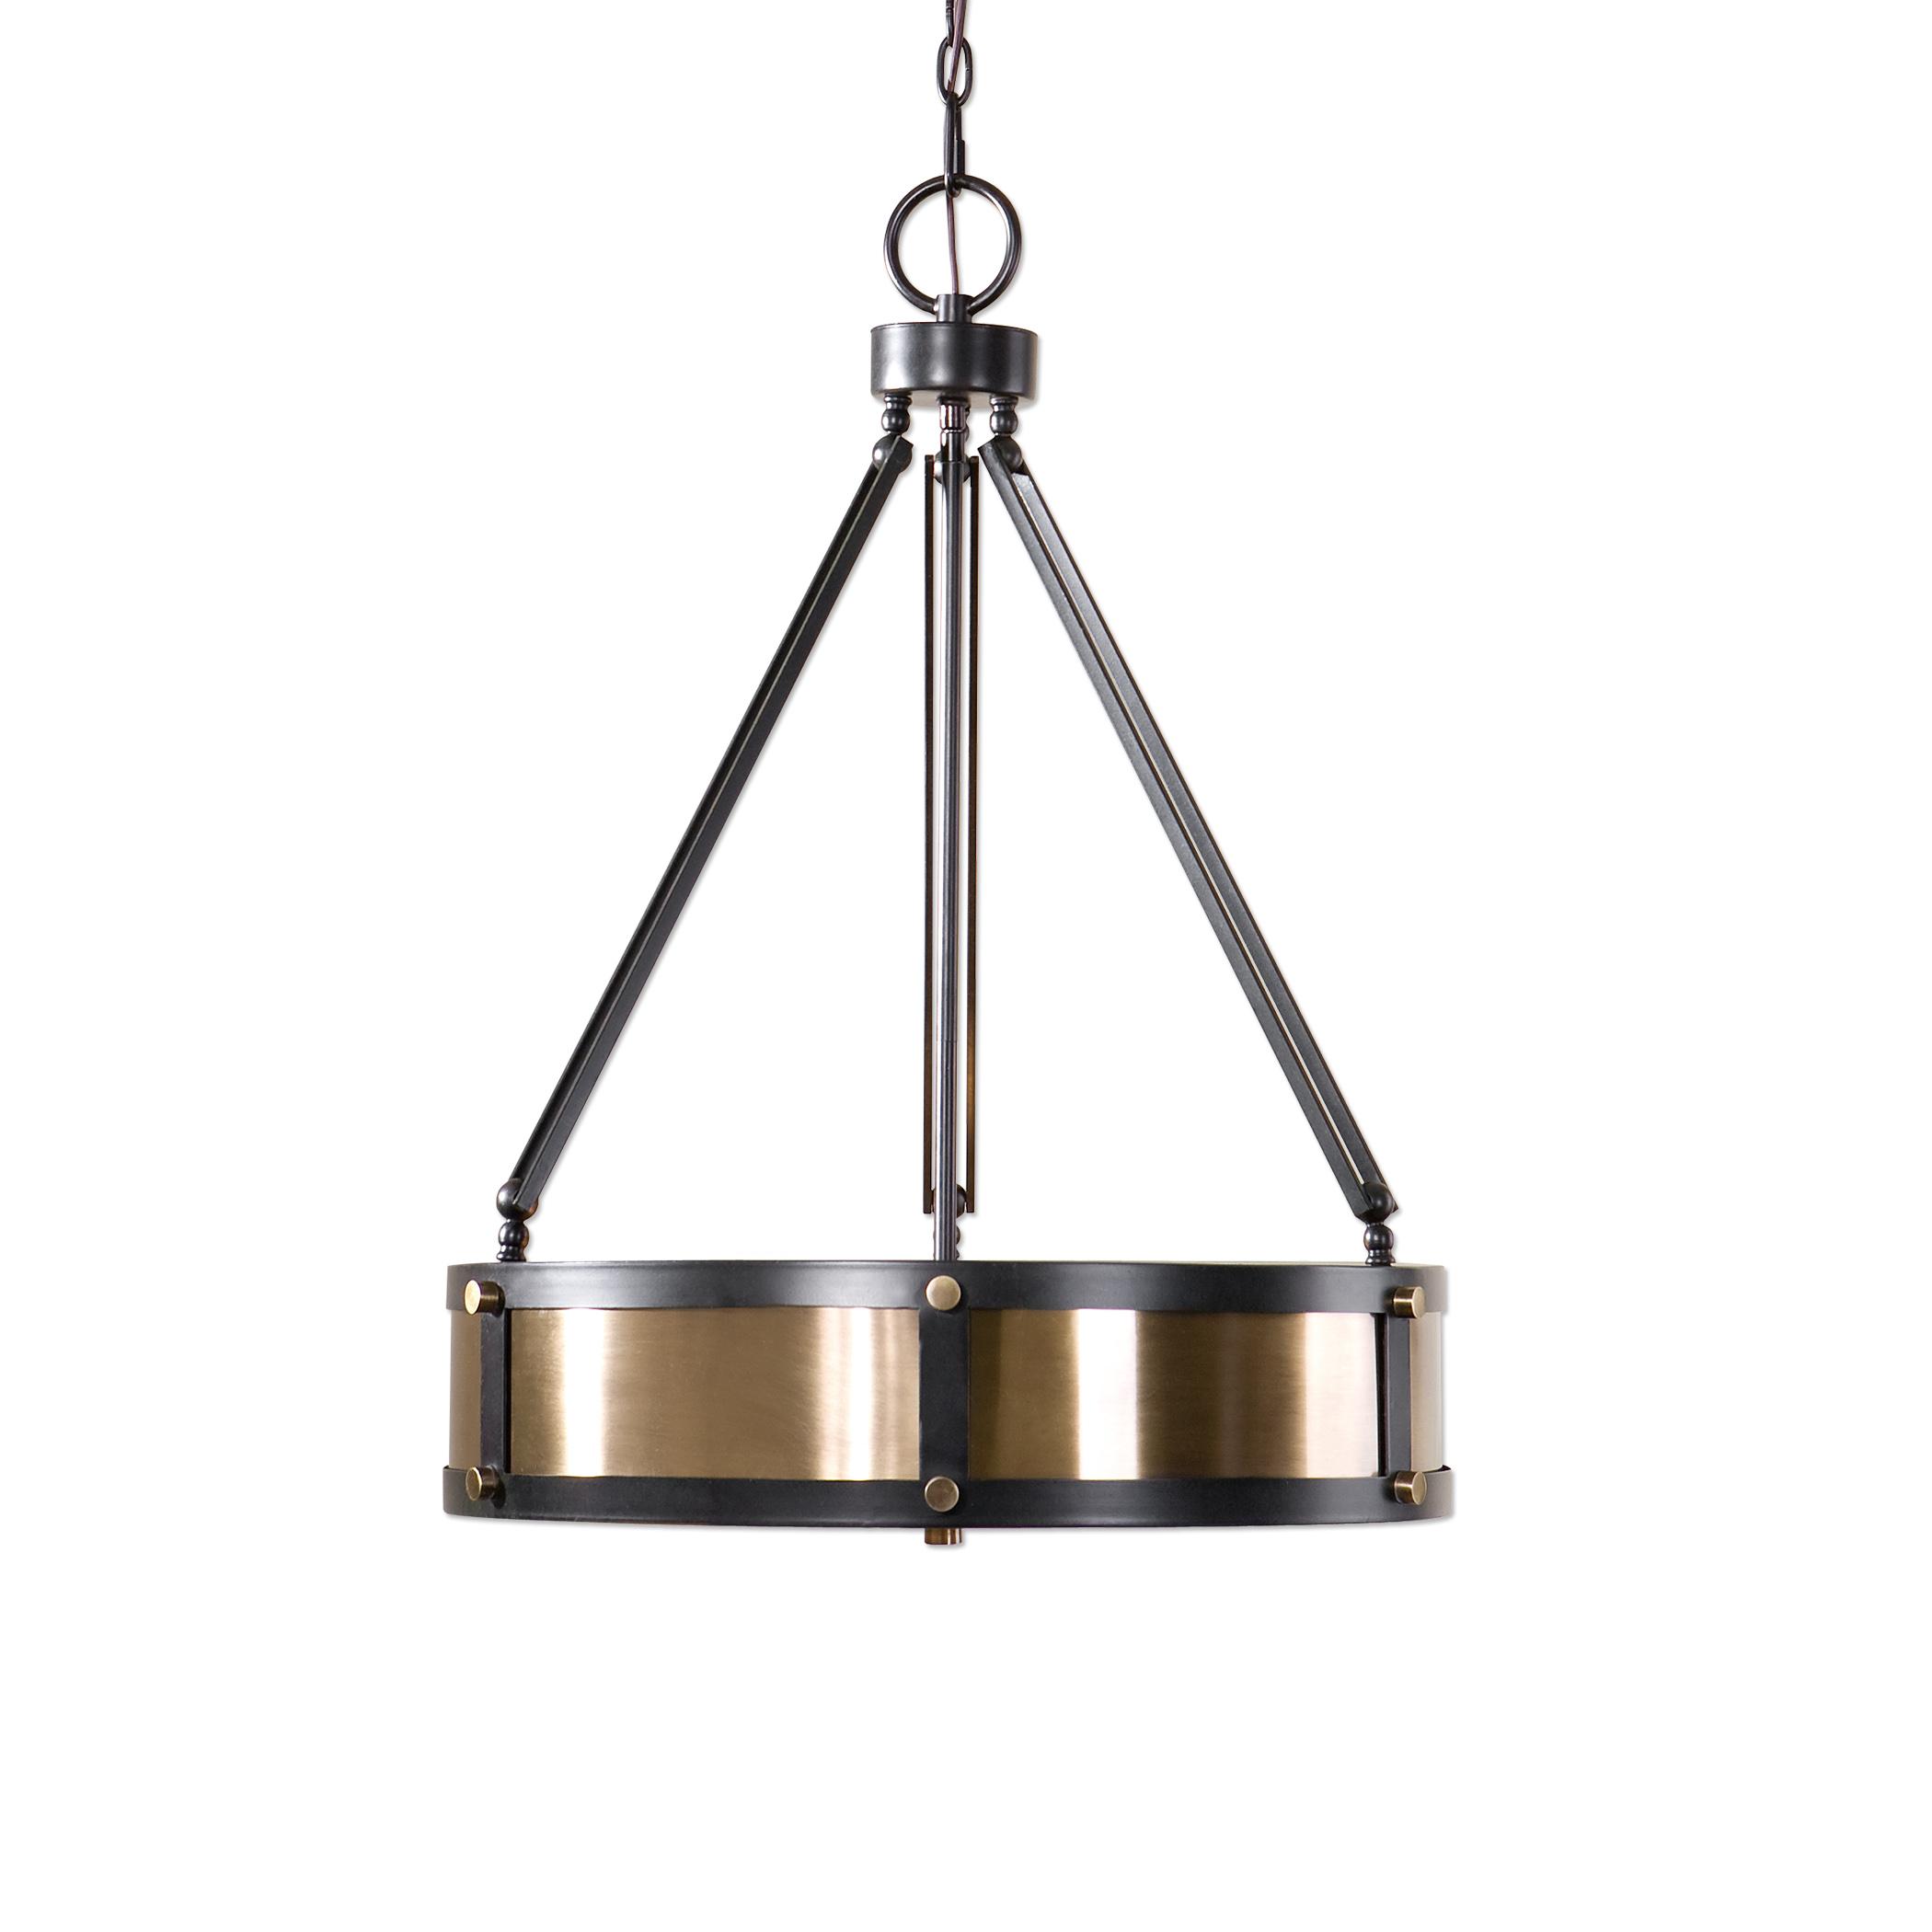 Uttermost Lighting Fixtures Tegus 3 Light Drum Pendant - Item Number: 22073